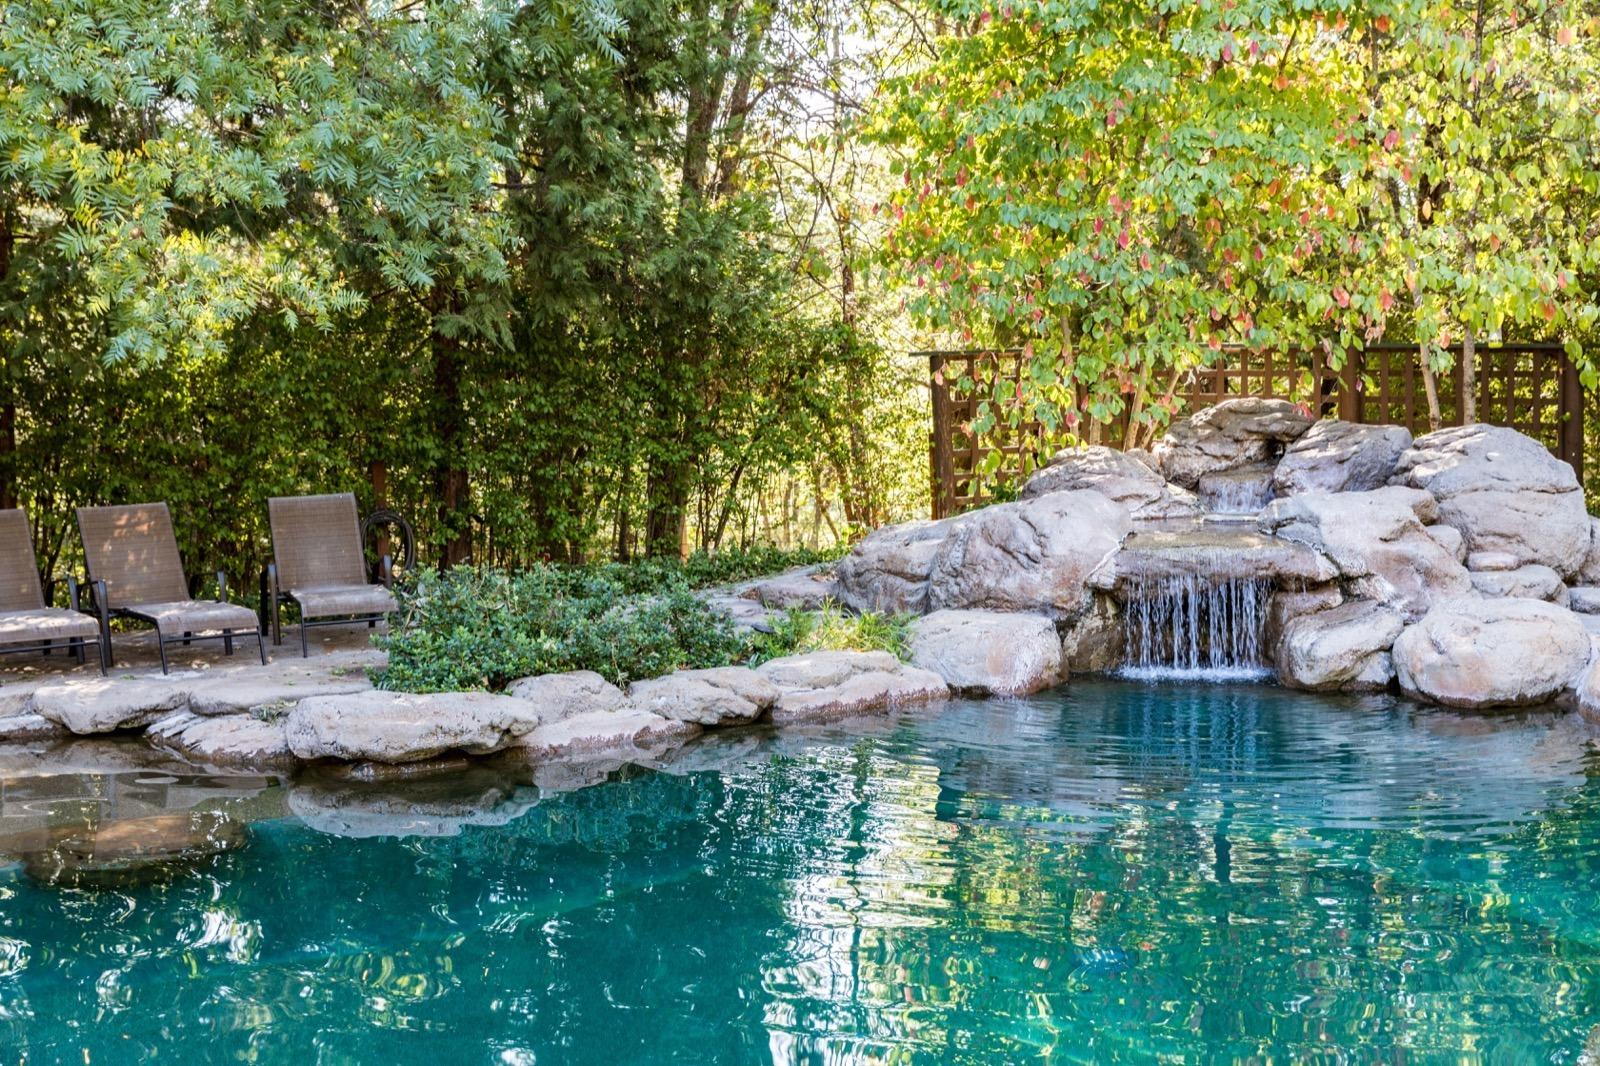 california-high-sierra-tuolumne-county-lodginig-accommodation-lazy-z-resort-2